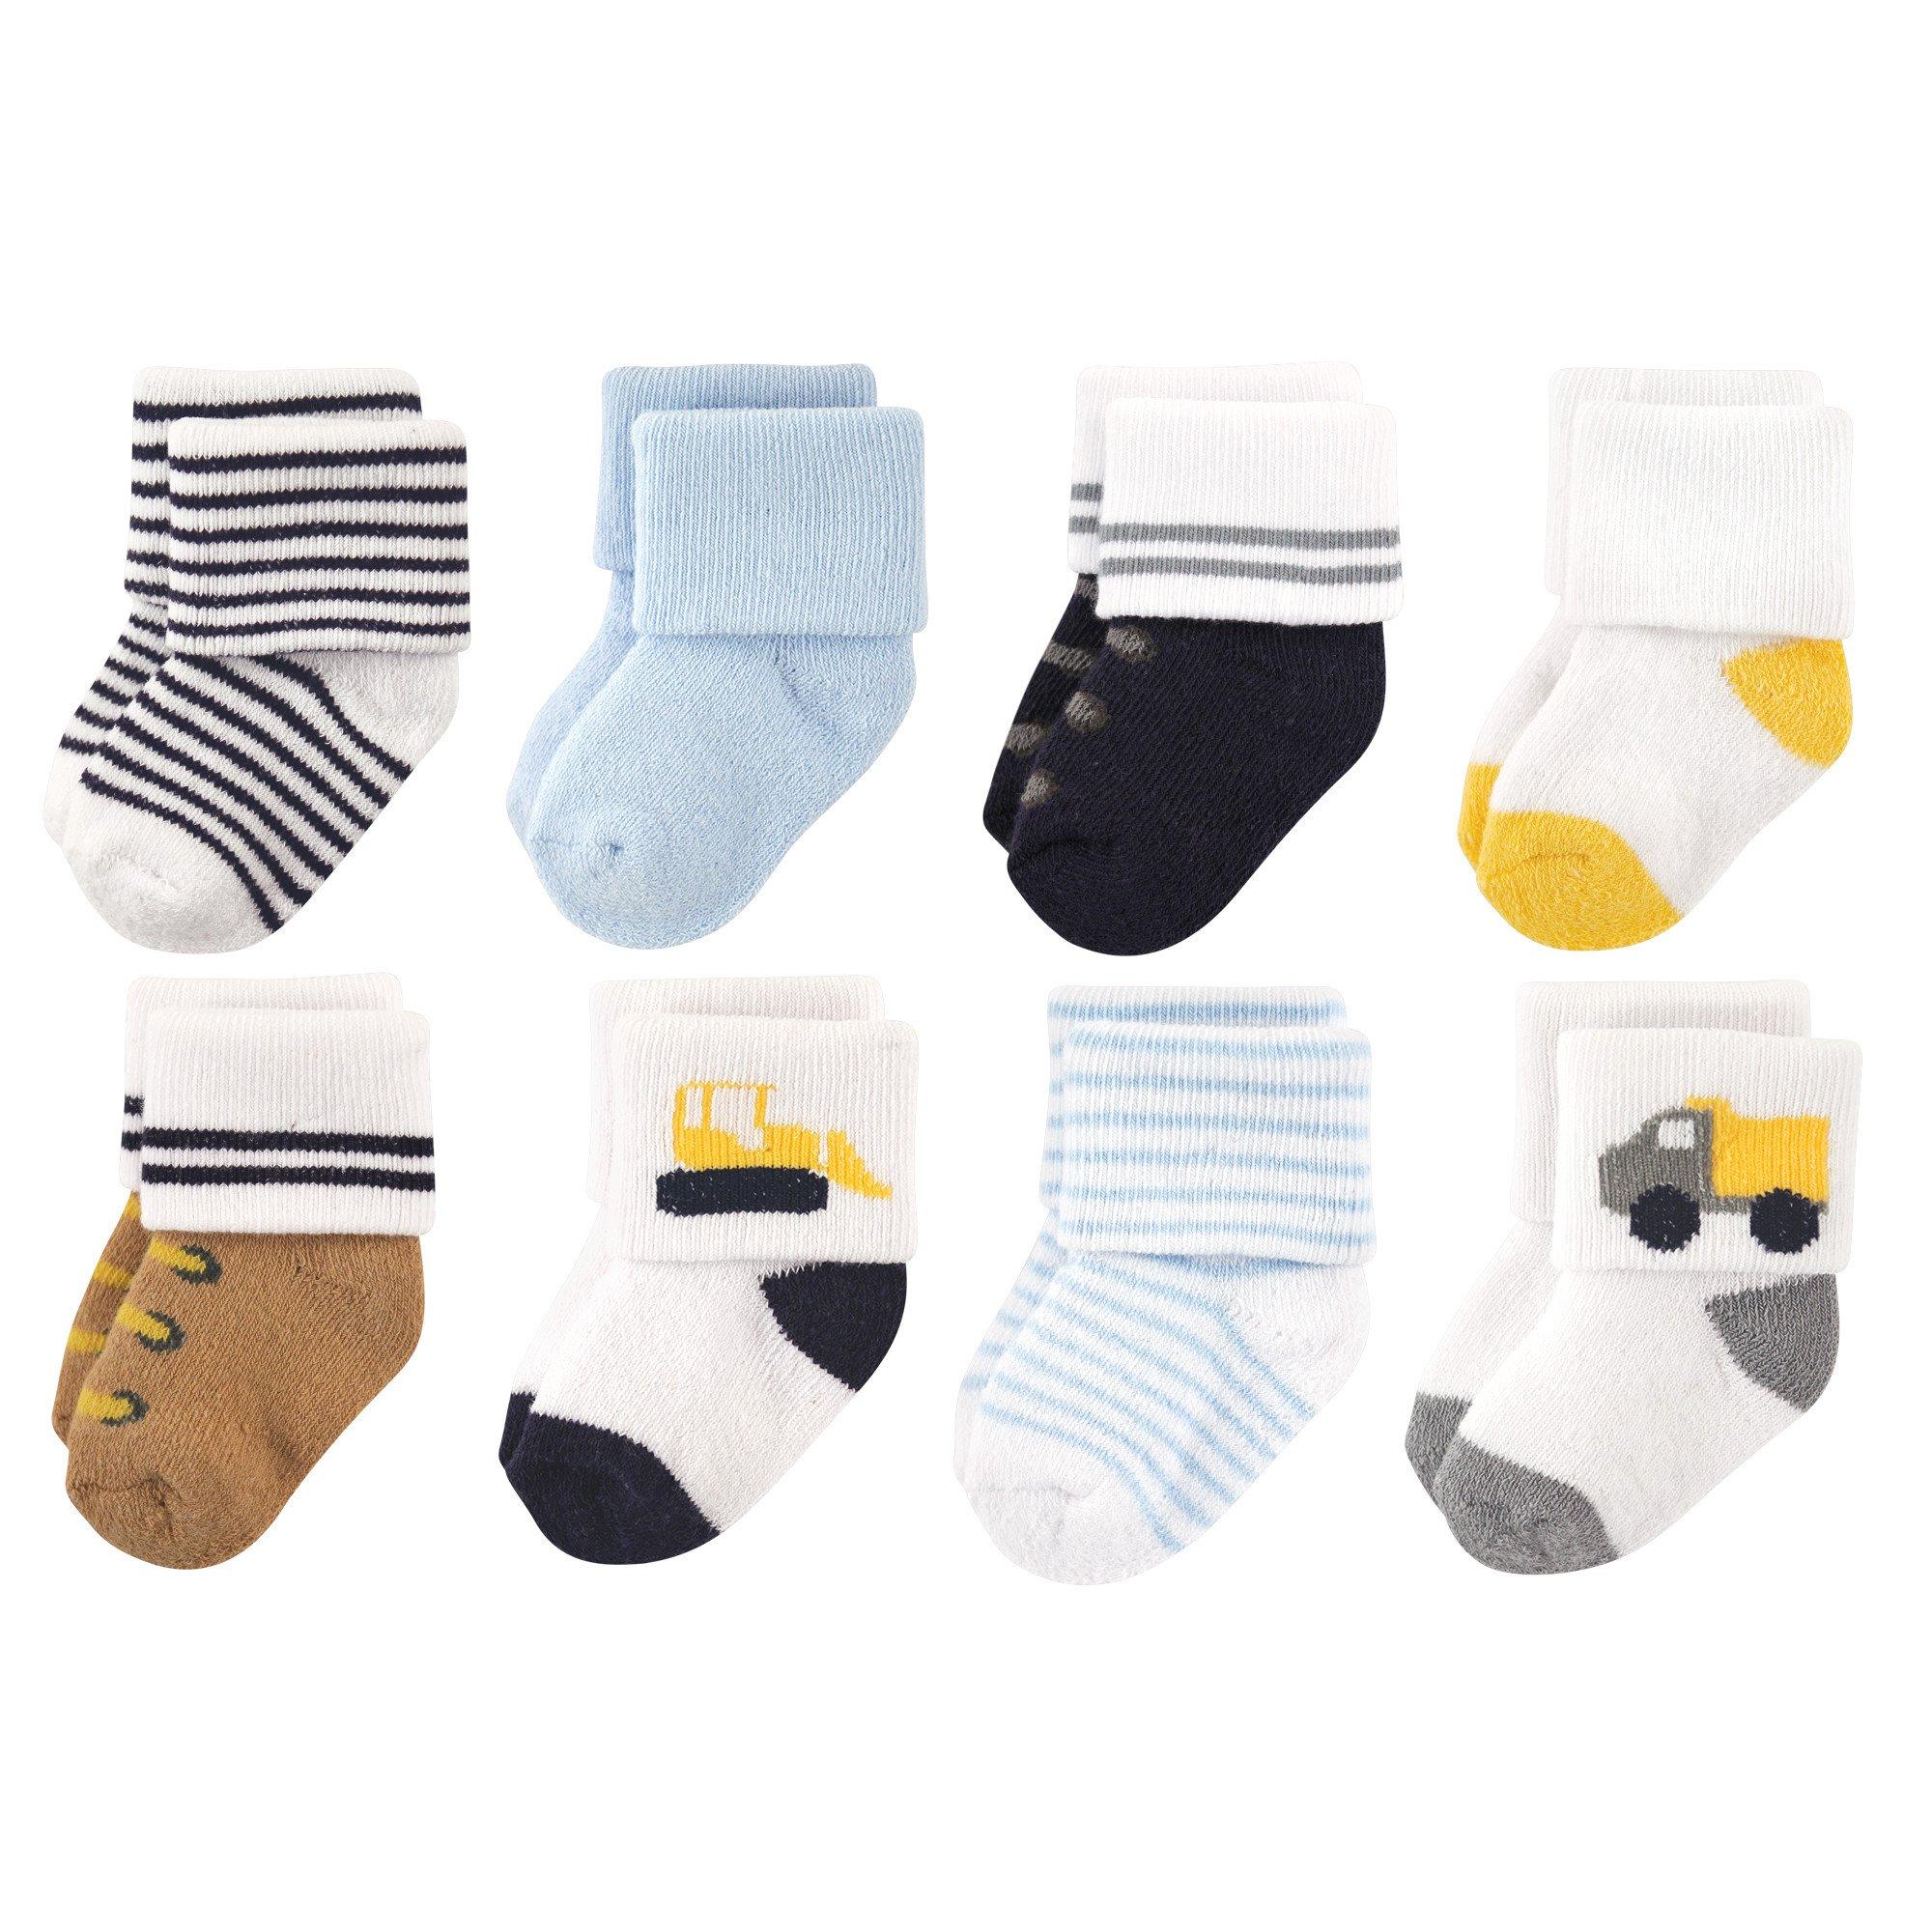 Luvable Friends Unisex Baby Socks, Bulldozer